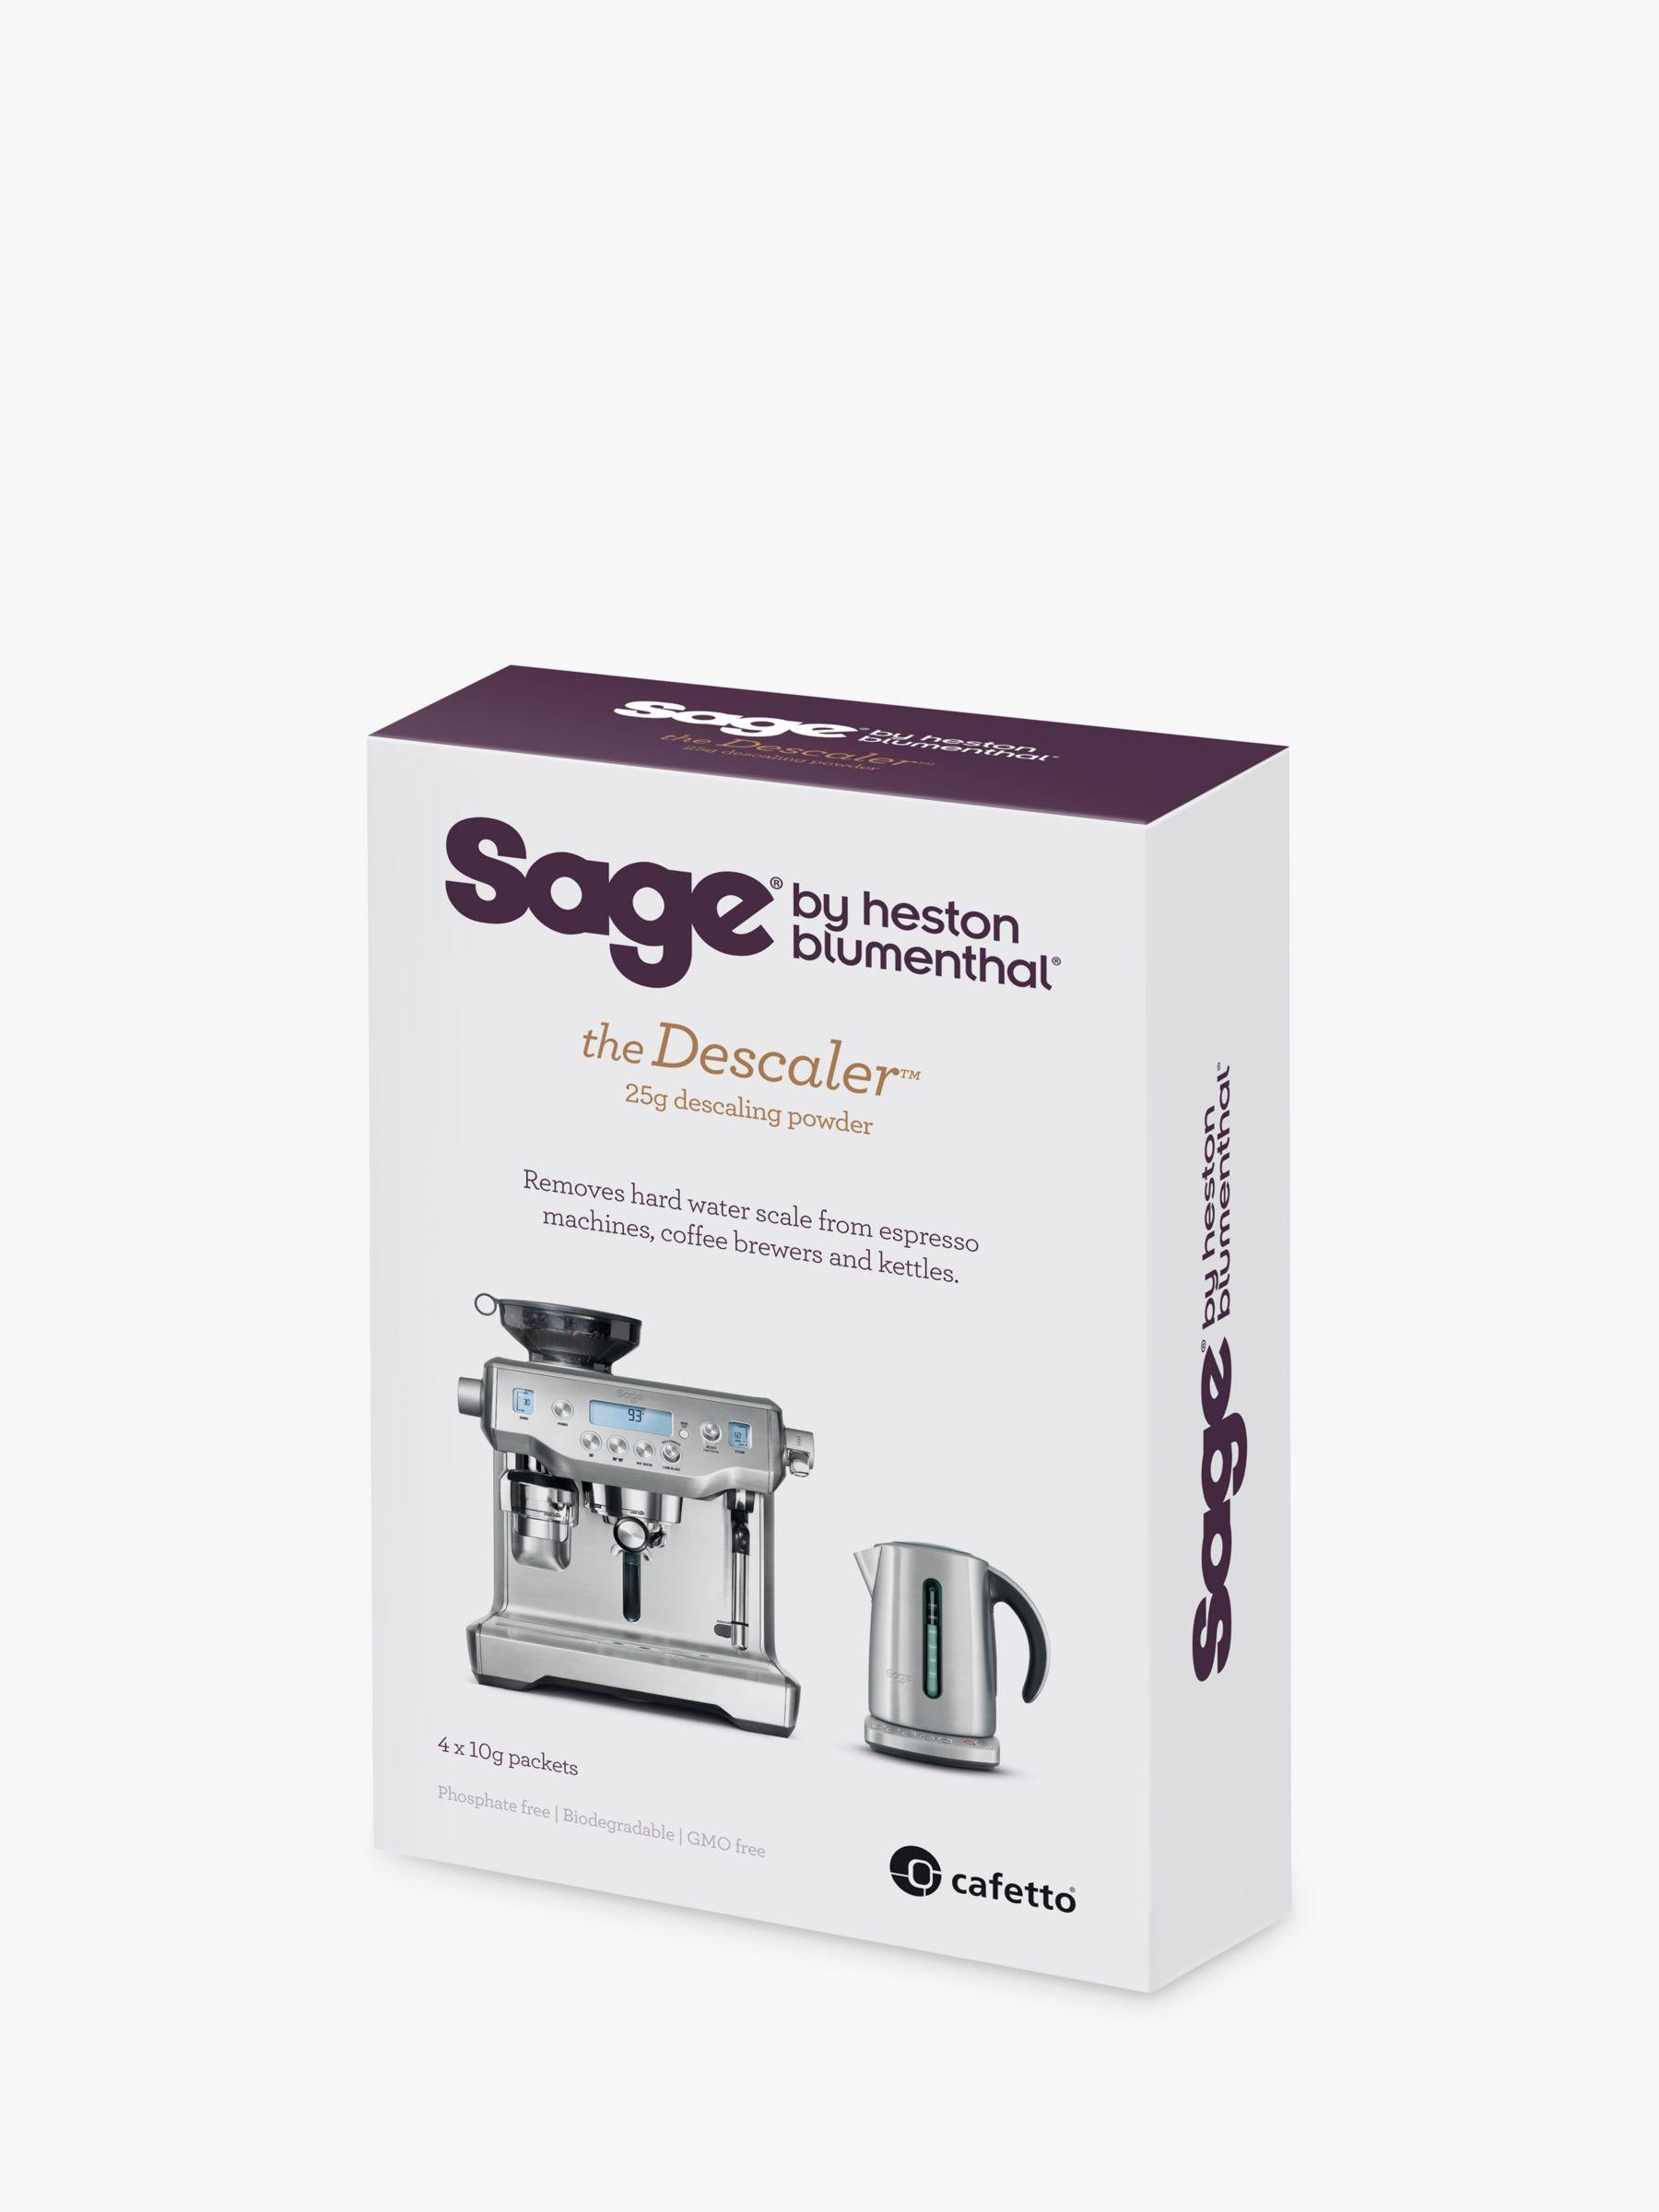 Sage Sage The Descaler